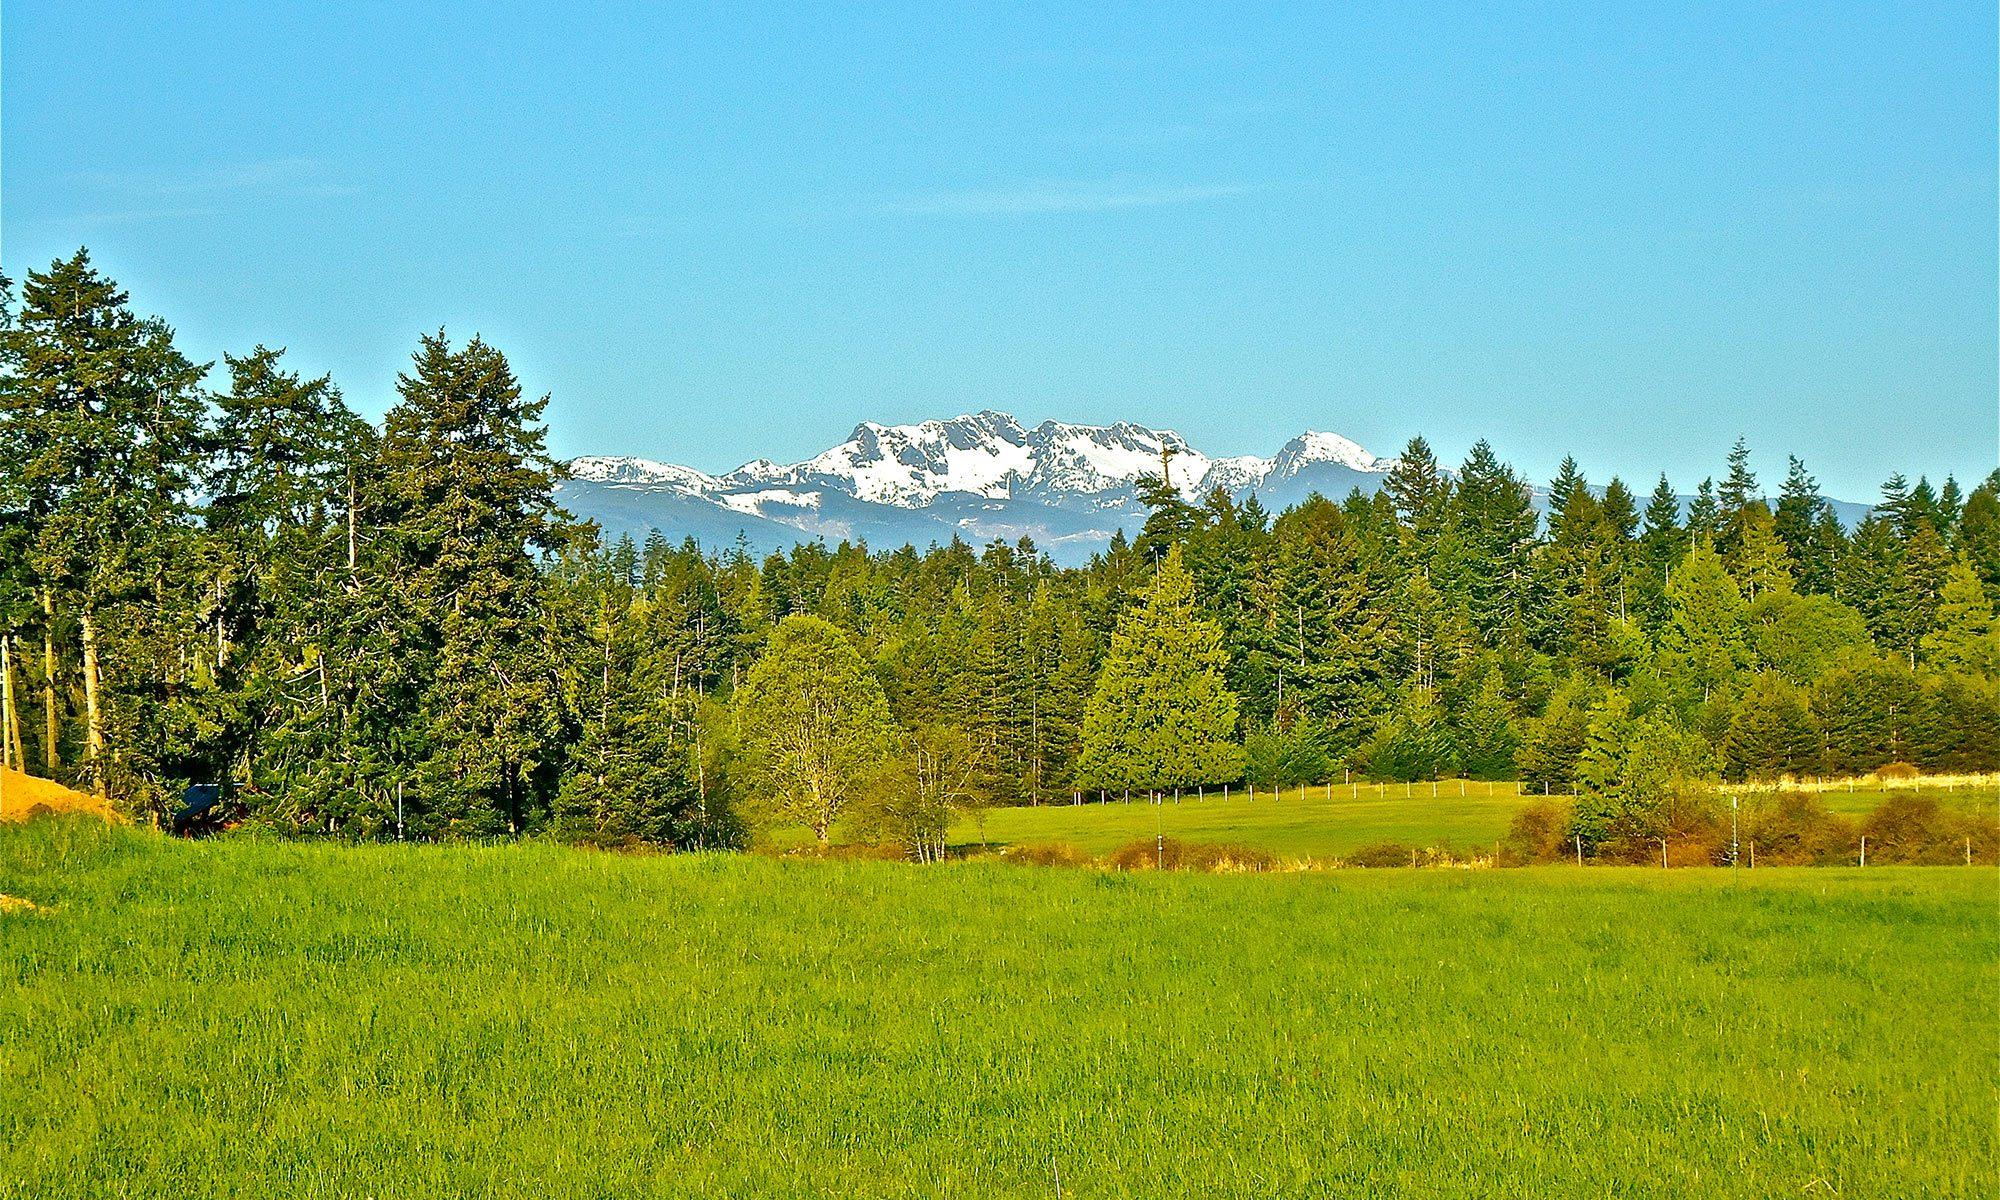 Northwest Bay Ranch